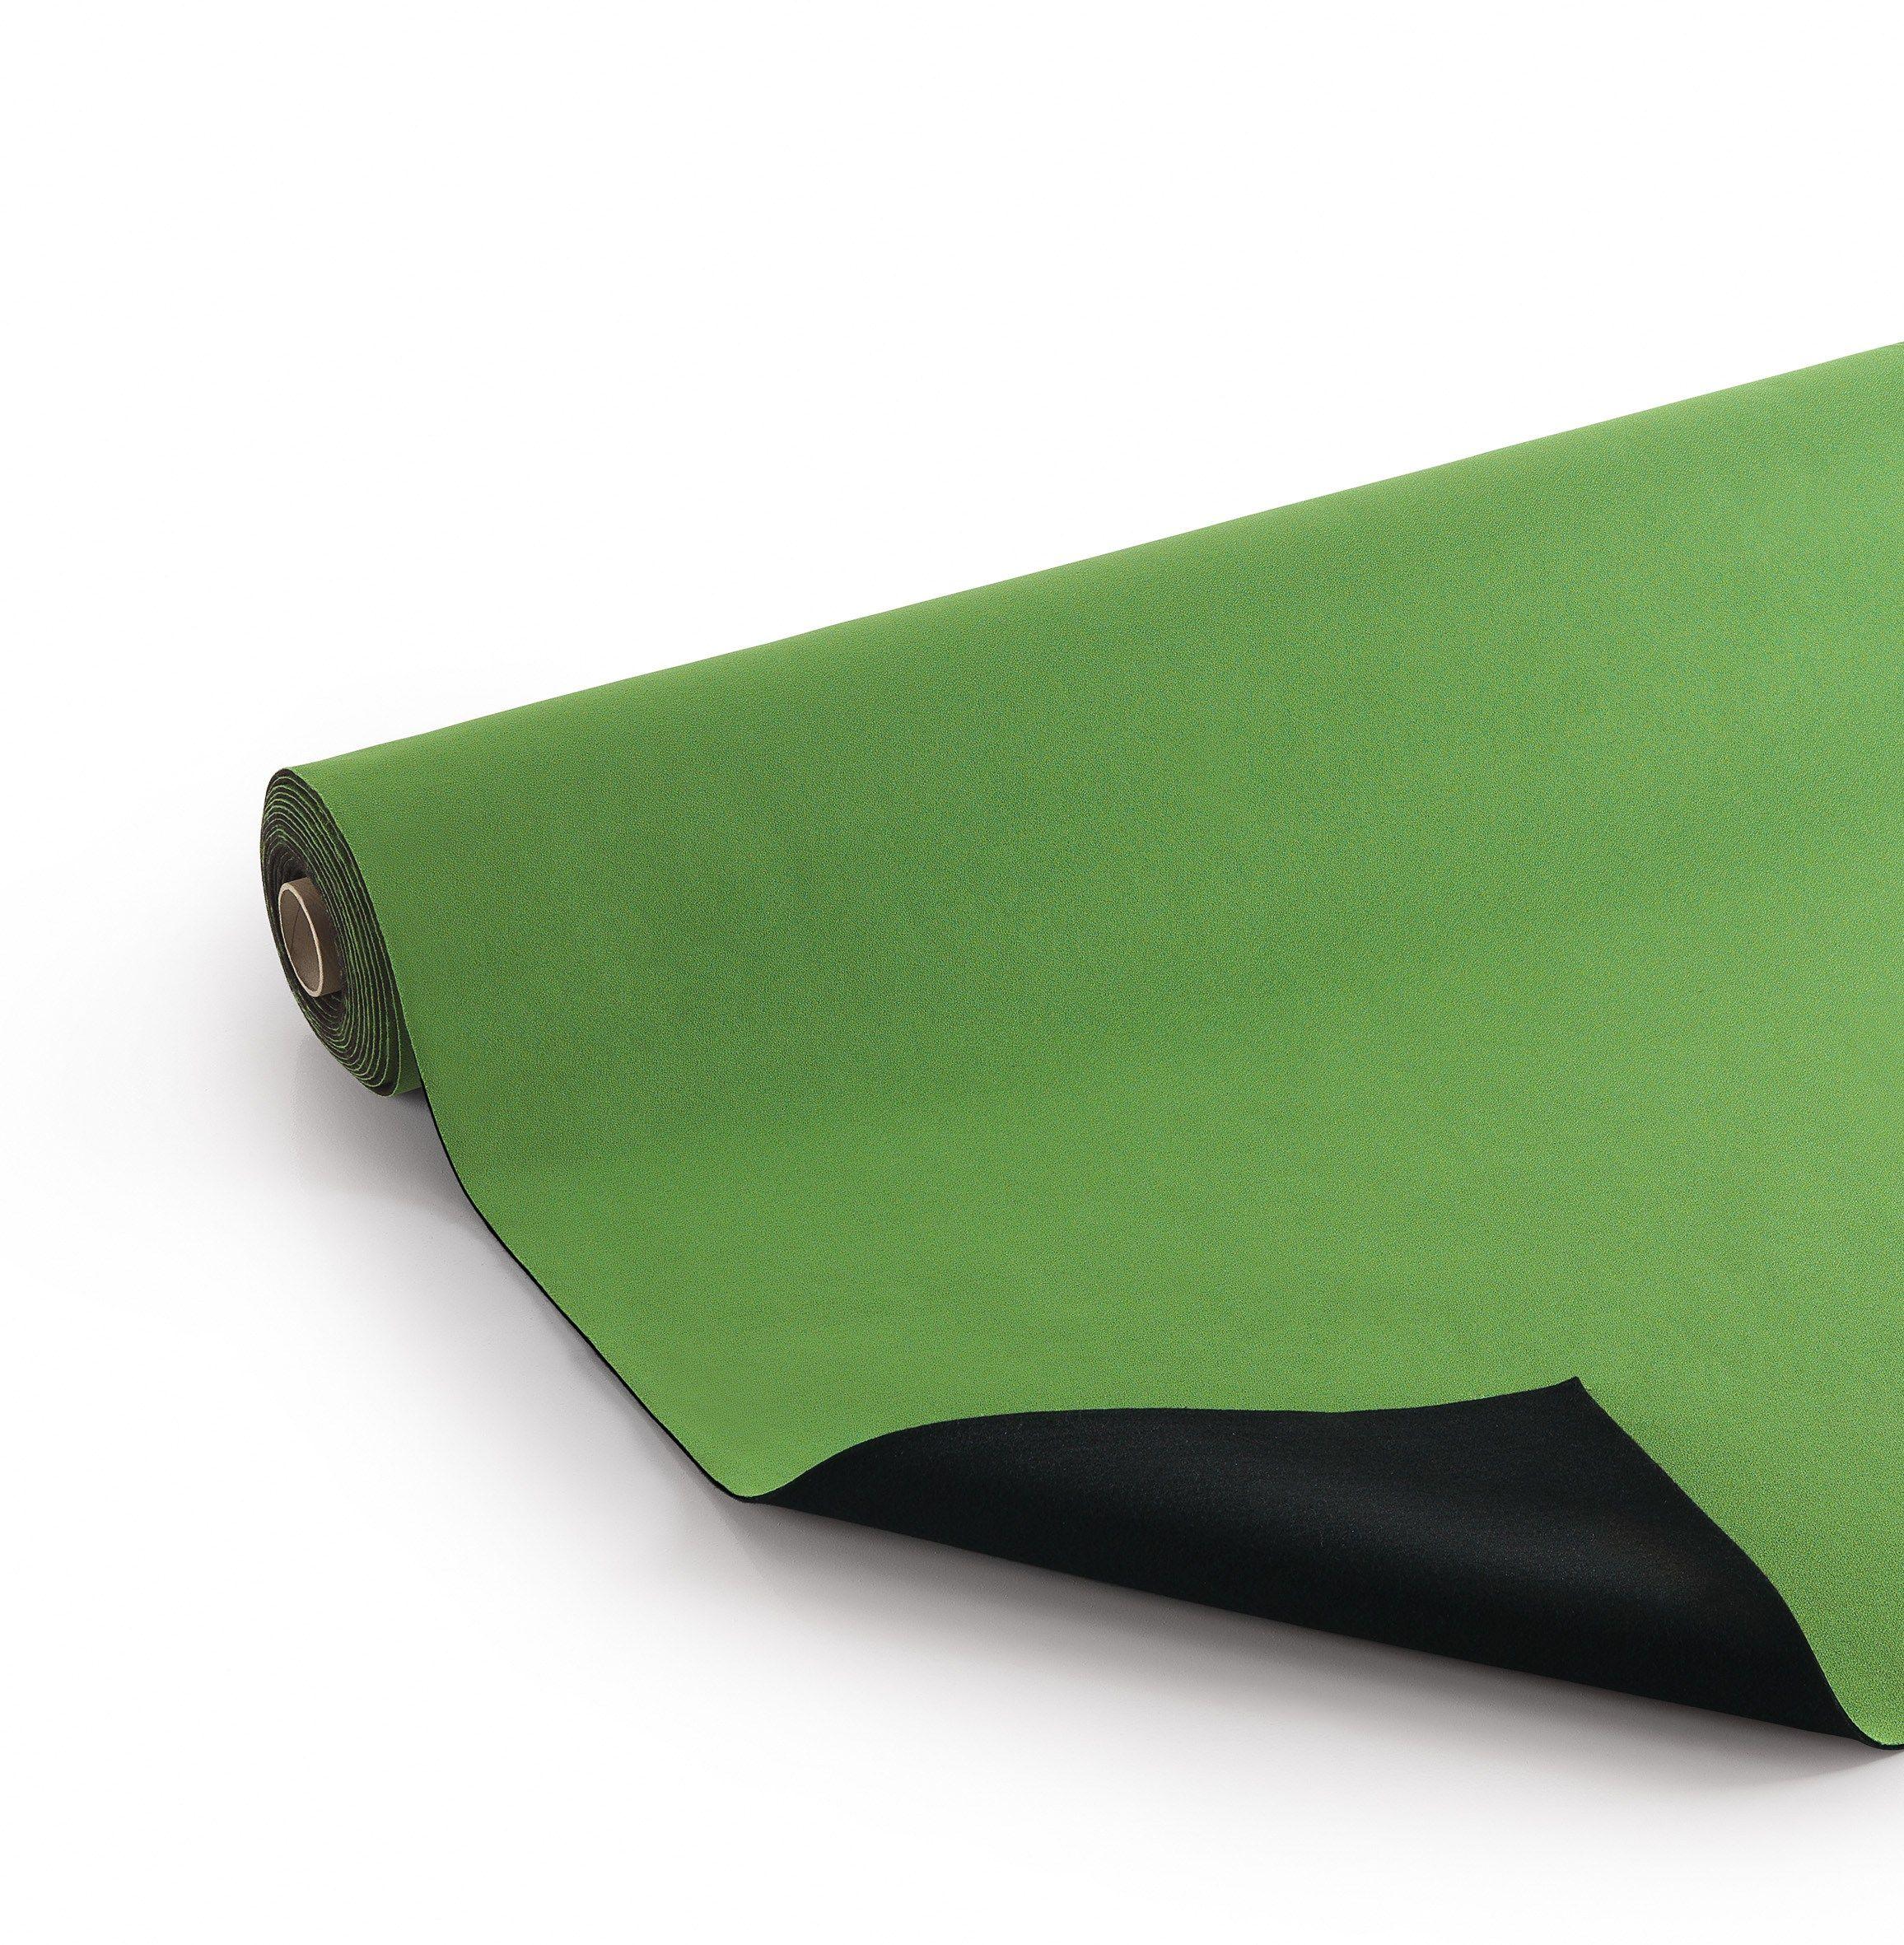 panneaux acoustiques d coratifs snowall by caimi brevetti design caimi lab. Black Bedroom Furniture Sets. Home Design Ideas